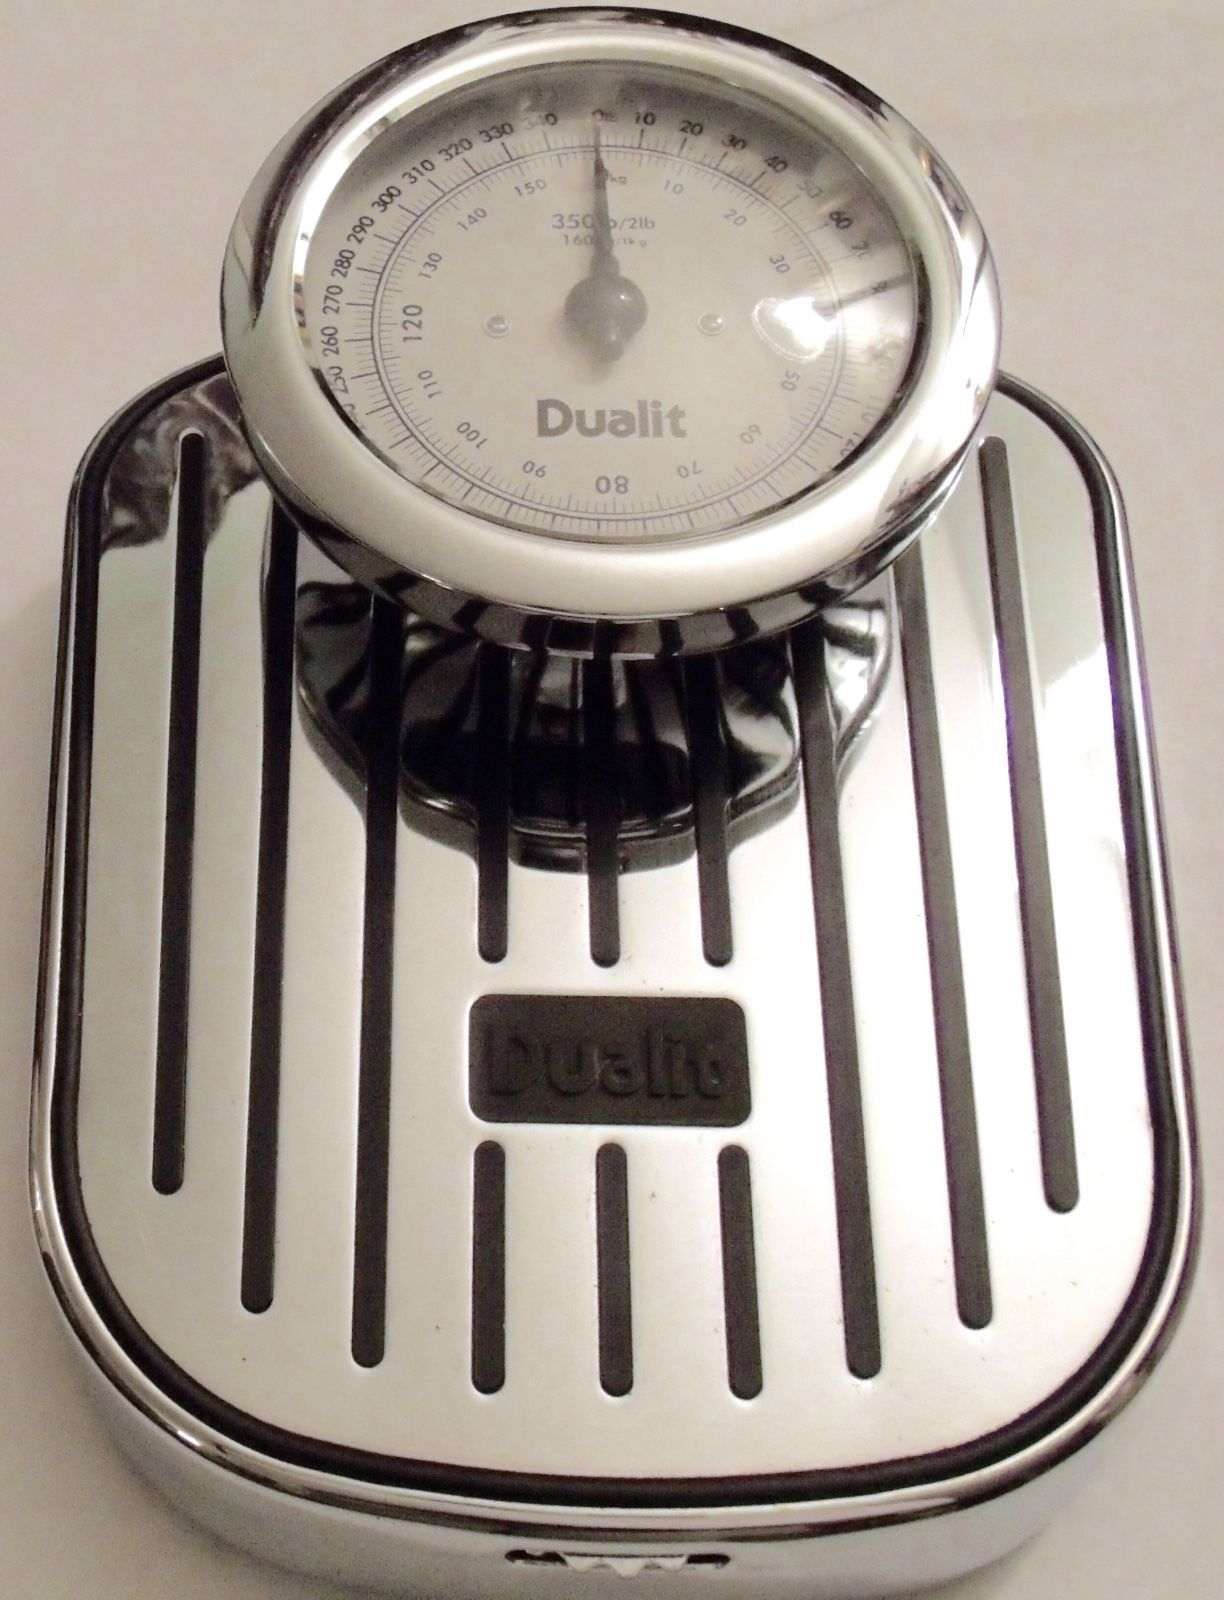 Dualit Bathroom Scale Chrome Black Retro 300  lbs Body Weight Management. Dualit Bathroom Scale Chrome Black Retro 300  lbs Body Weight